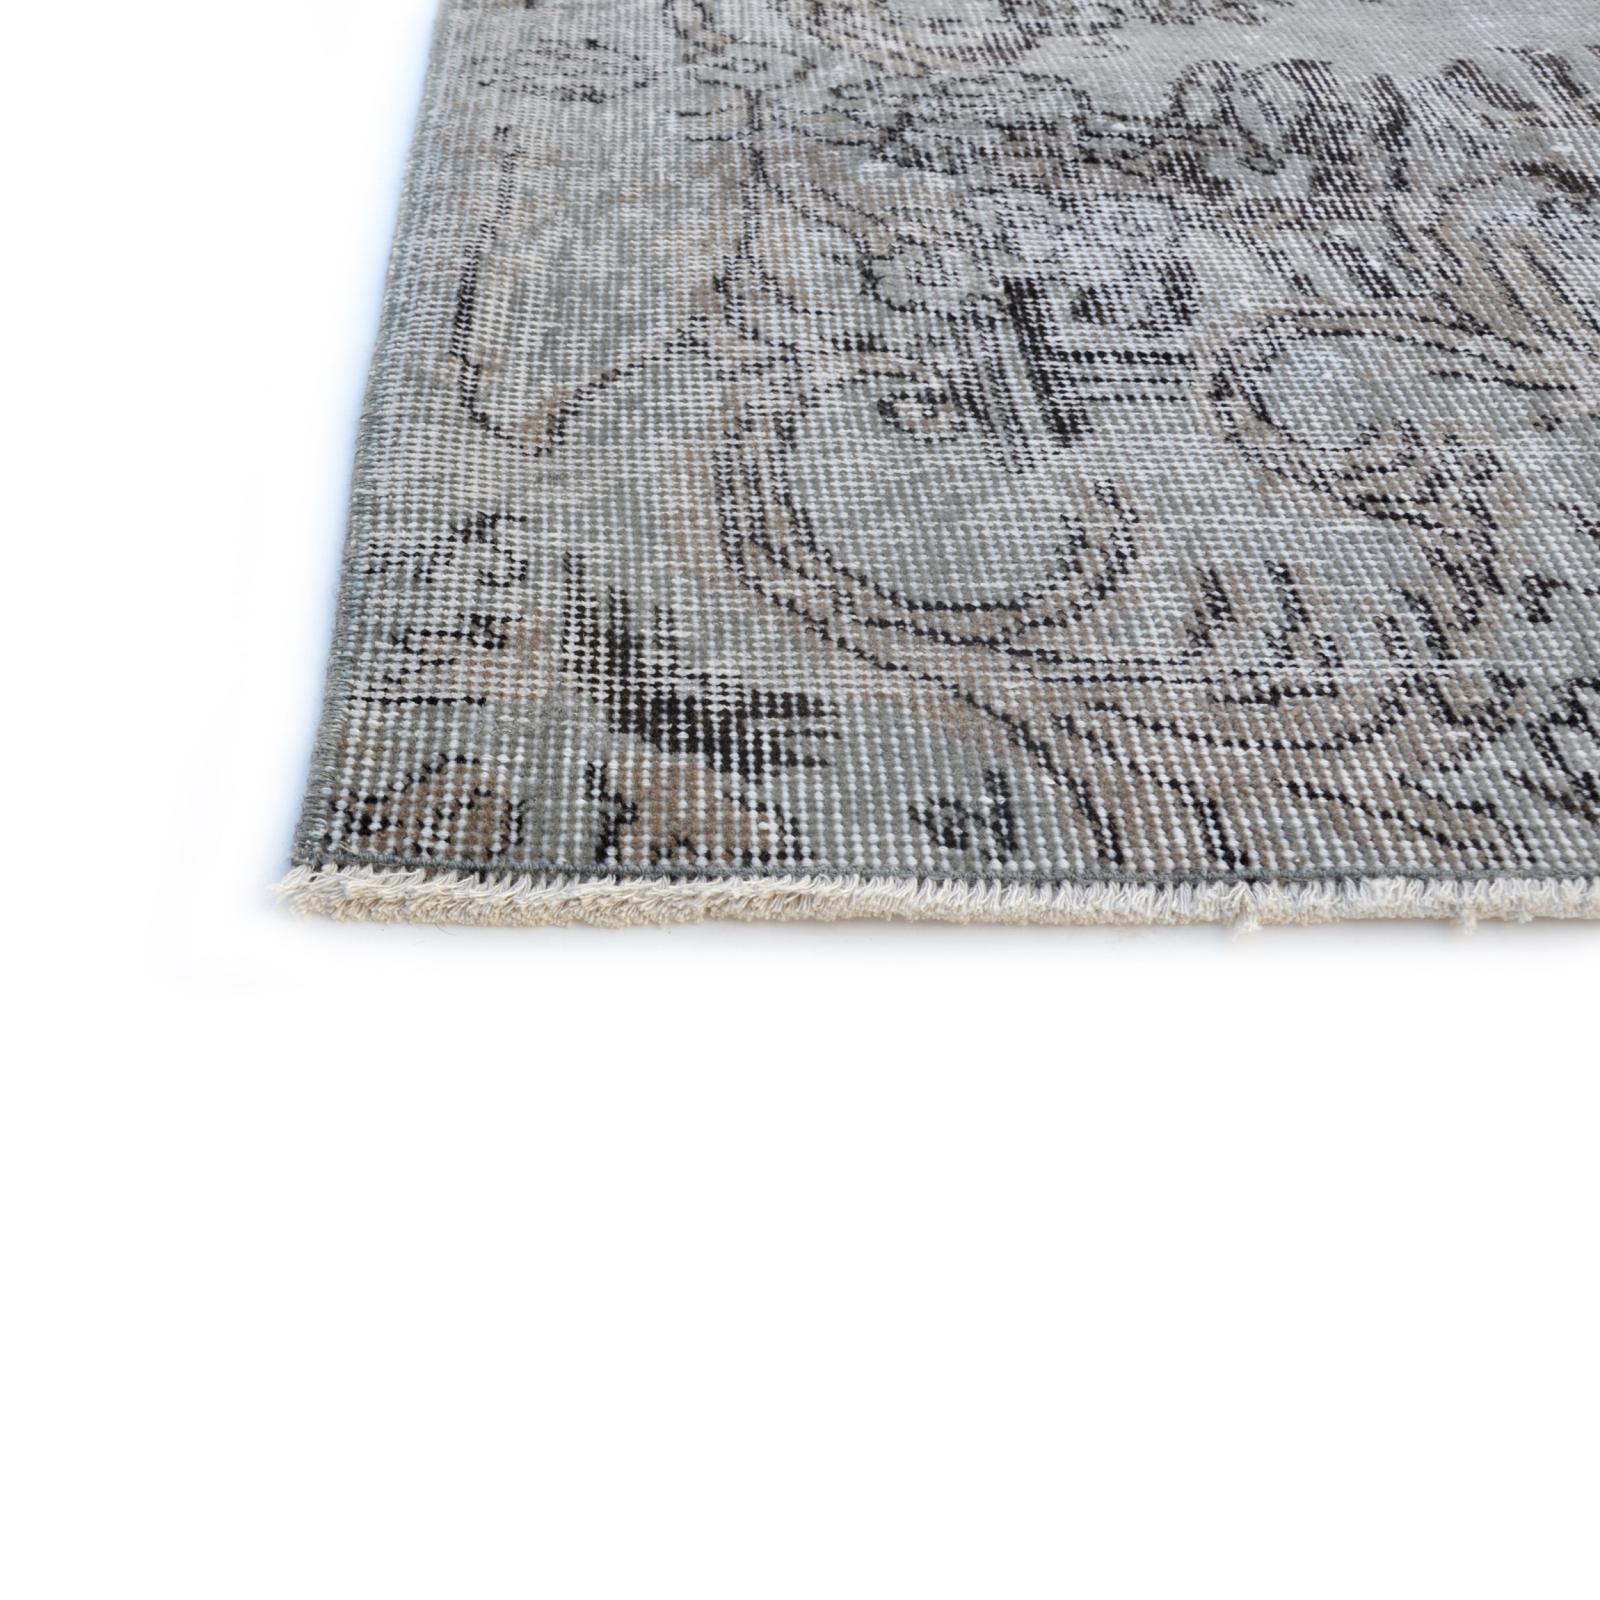 Grau vintage umgefärbt teppich (301x203cm)